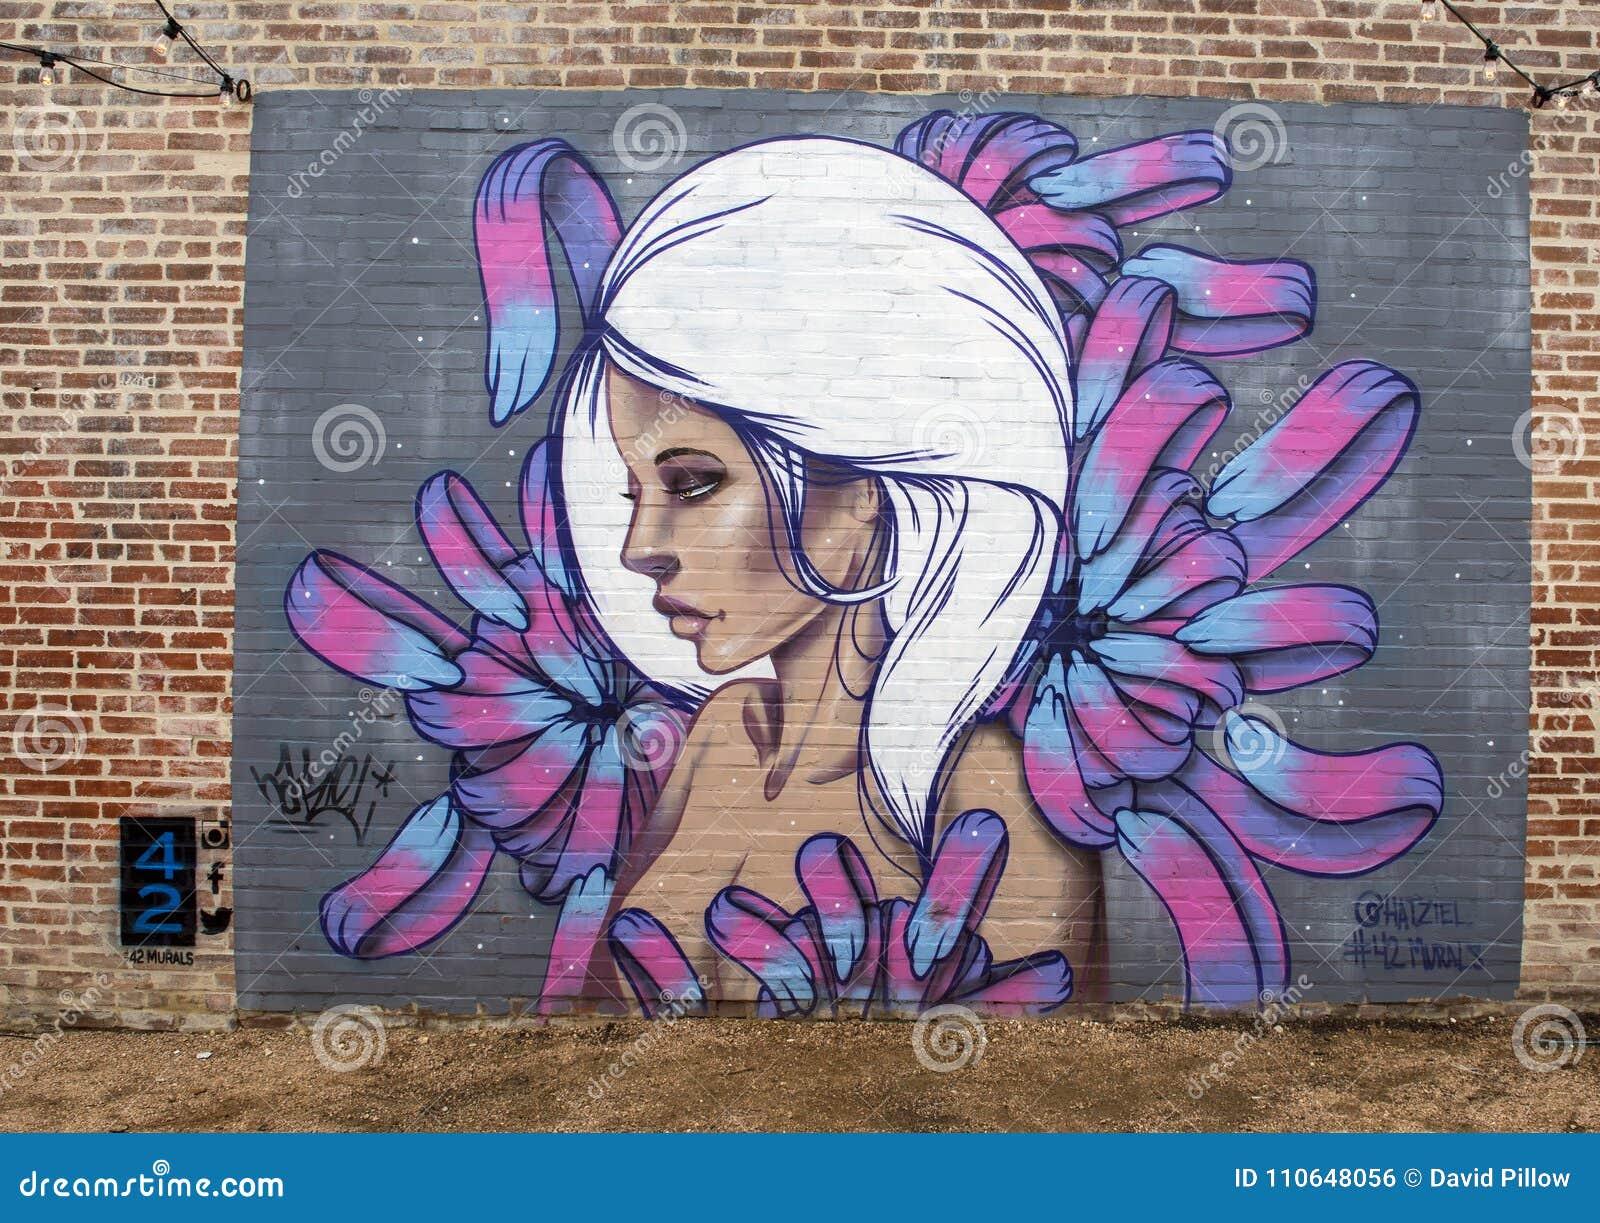 42 Murals Project Wall Mural By Hatziel Flores Deep Ellum Texas